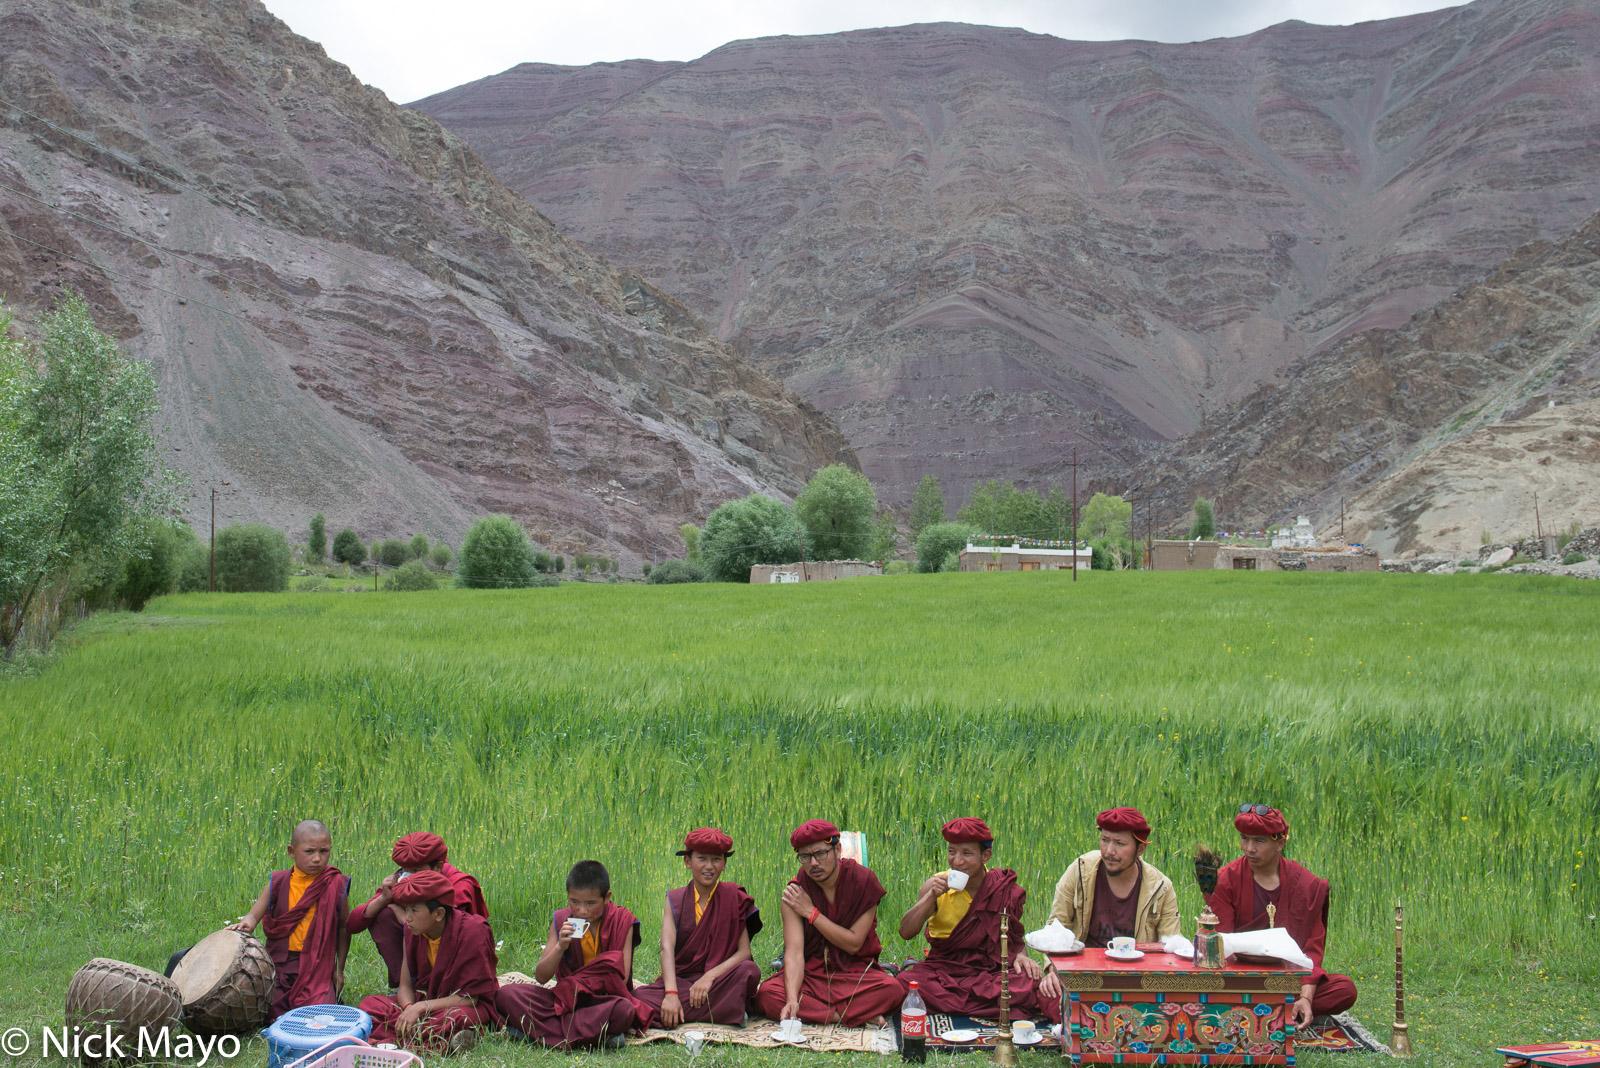 Drum, Horn, India, Ladakh, Monk, Religious Ritual, photo